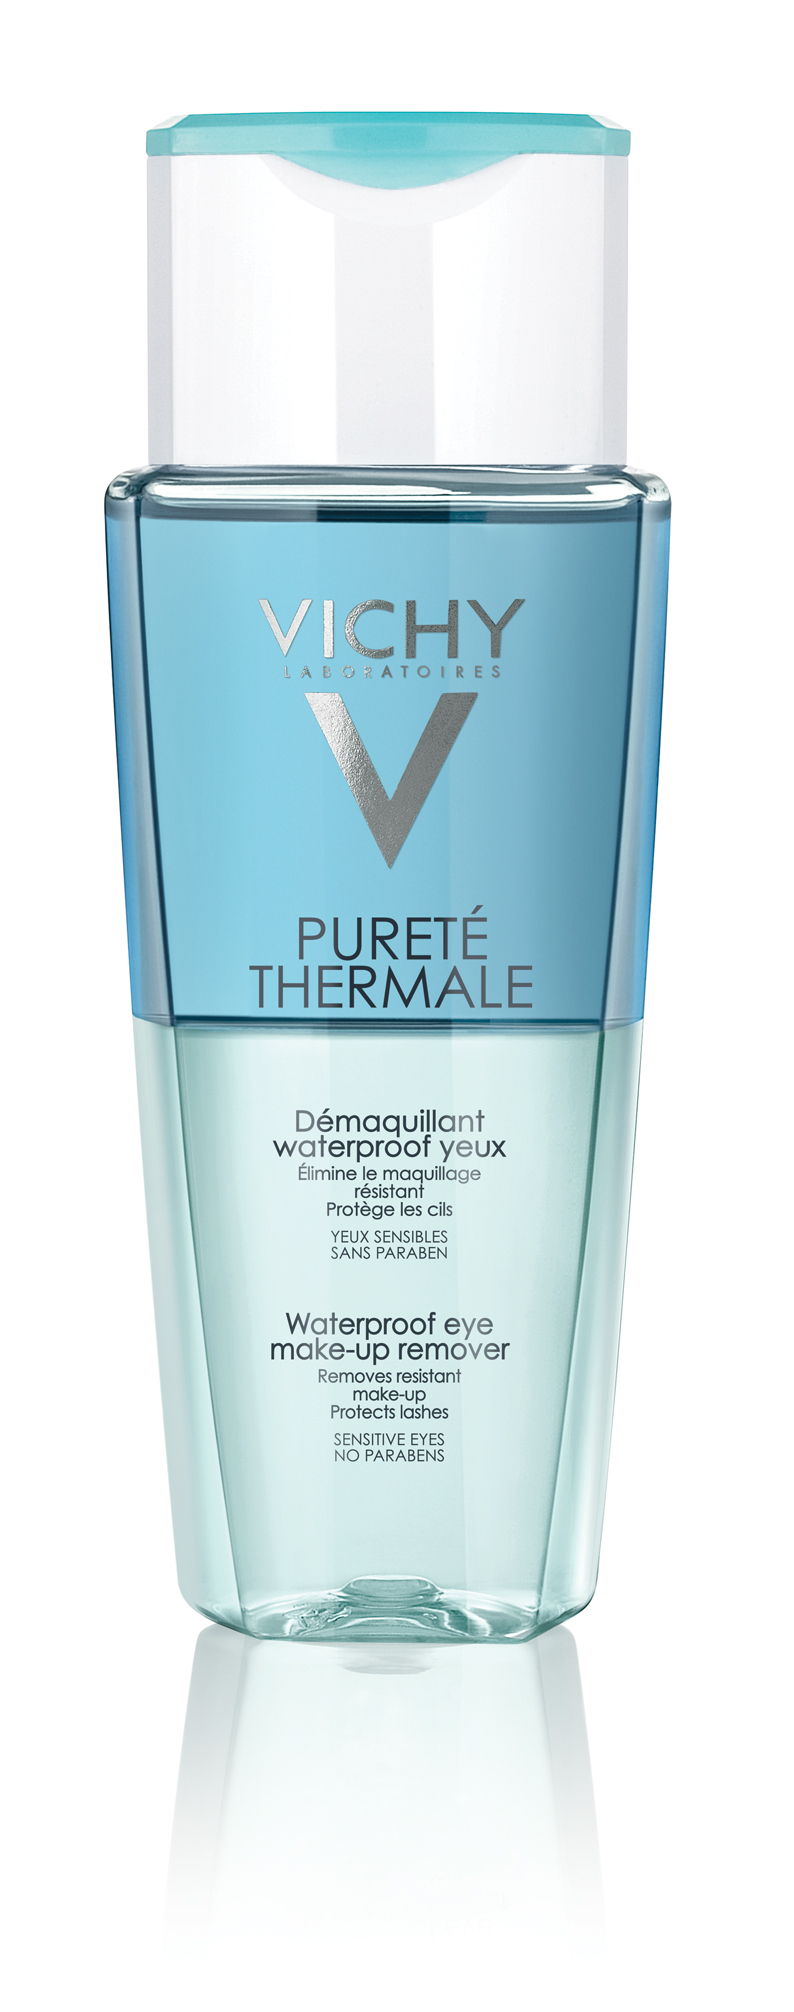 Vichy Puretu00e9 Thermale Waterproof Eye Makeup Remover Reviews In Eye Makeup Remover - ChickAdvisor